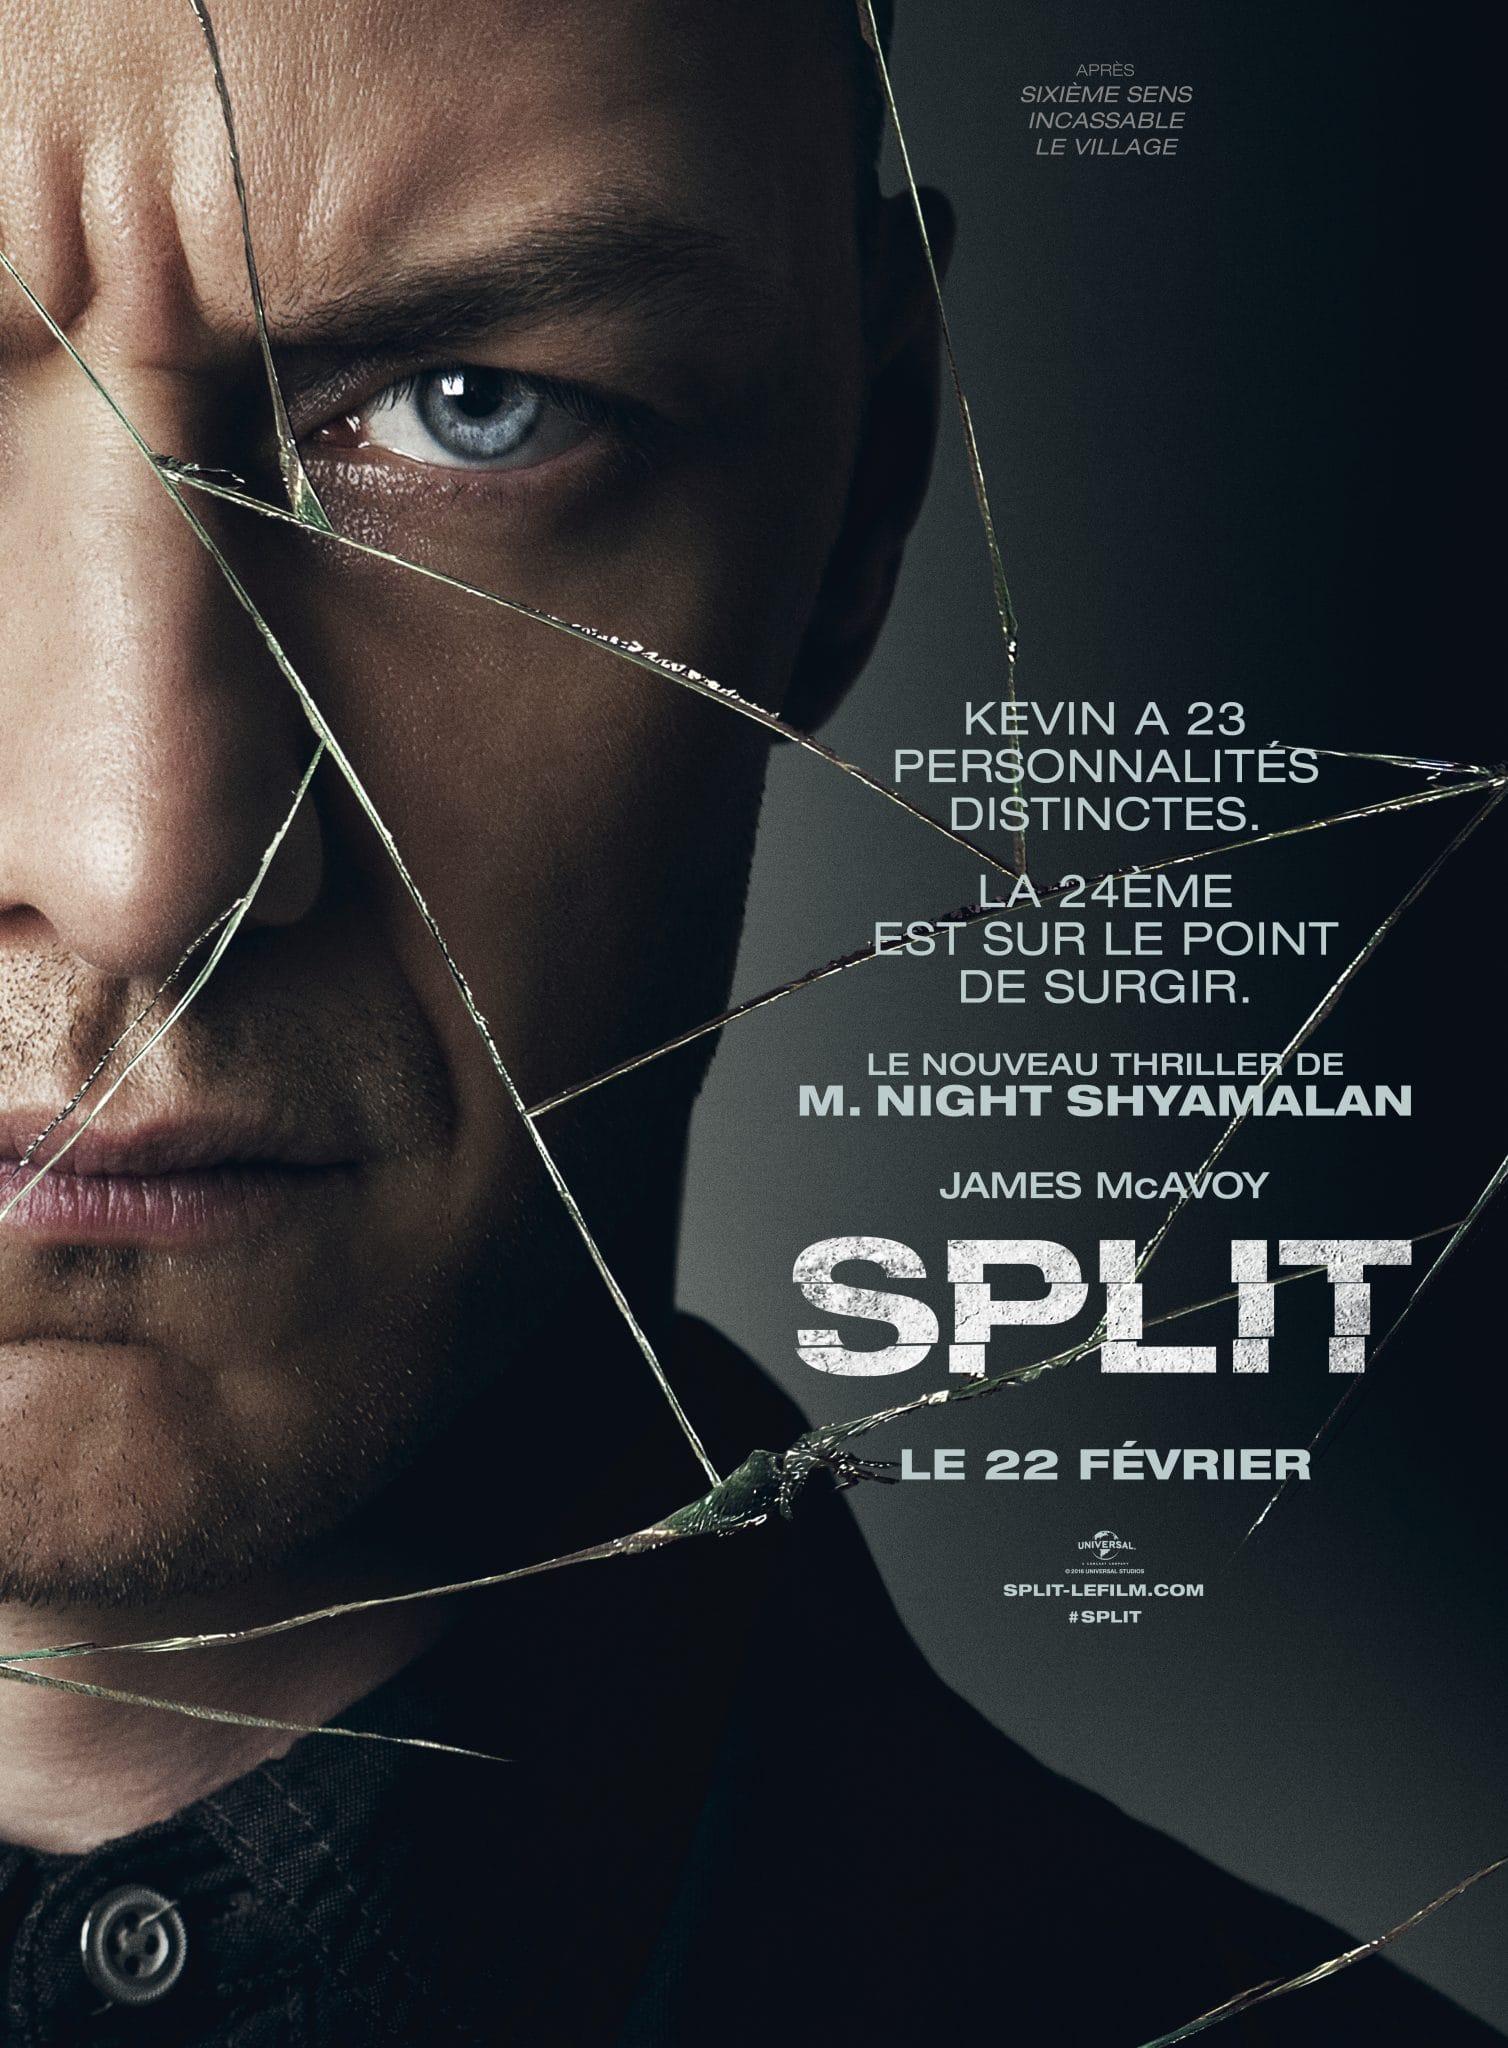 Split affiche night shyamalan